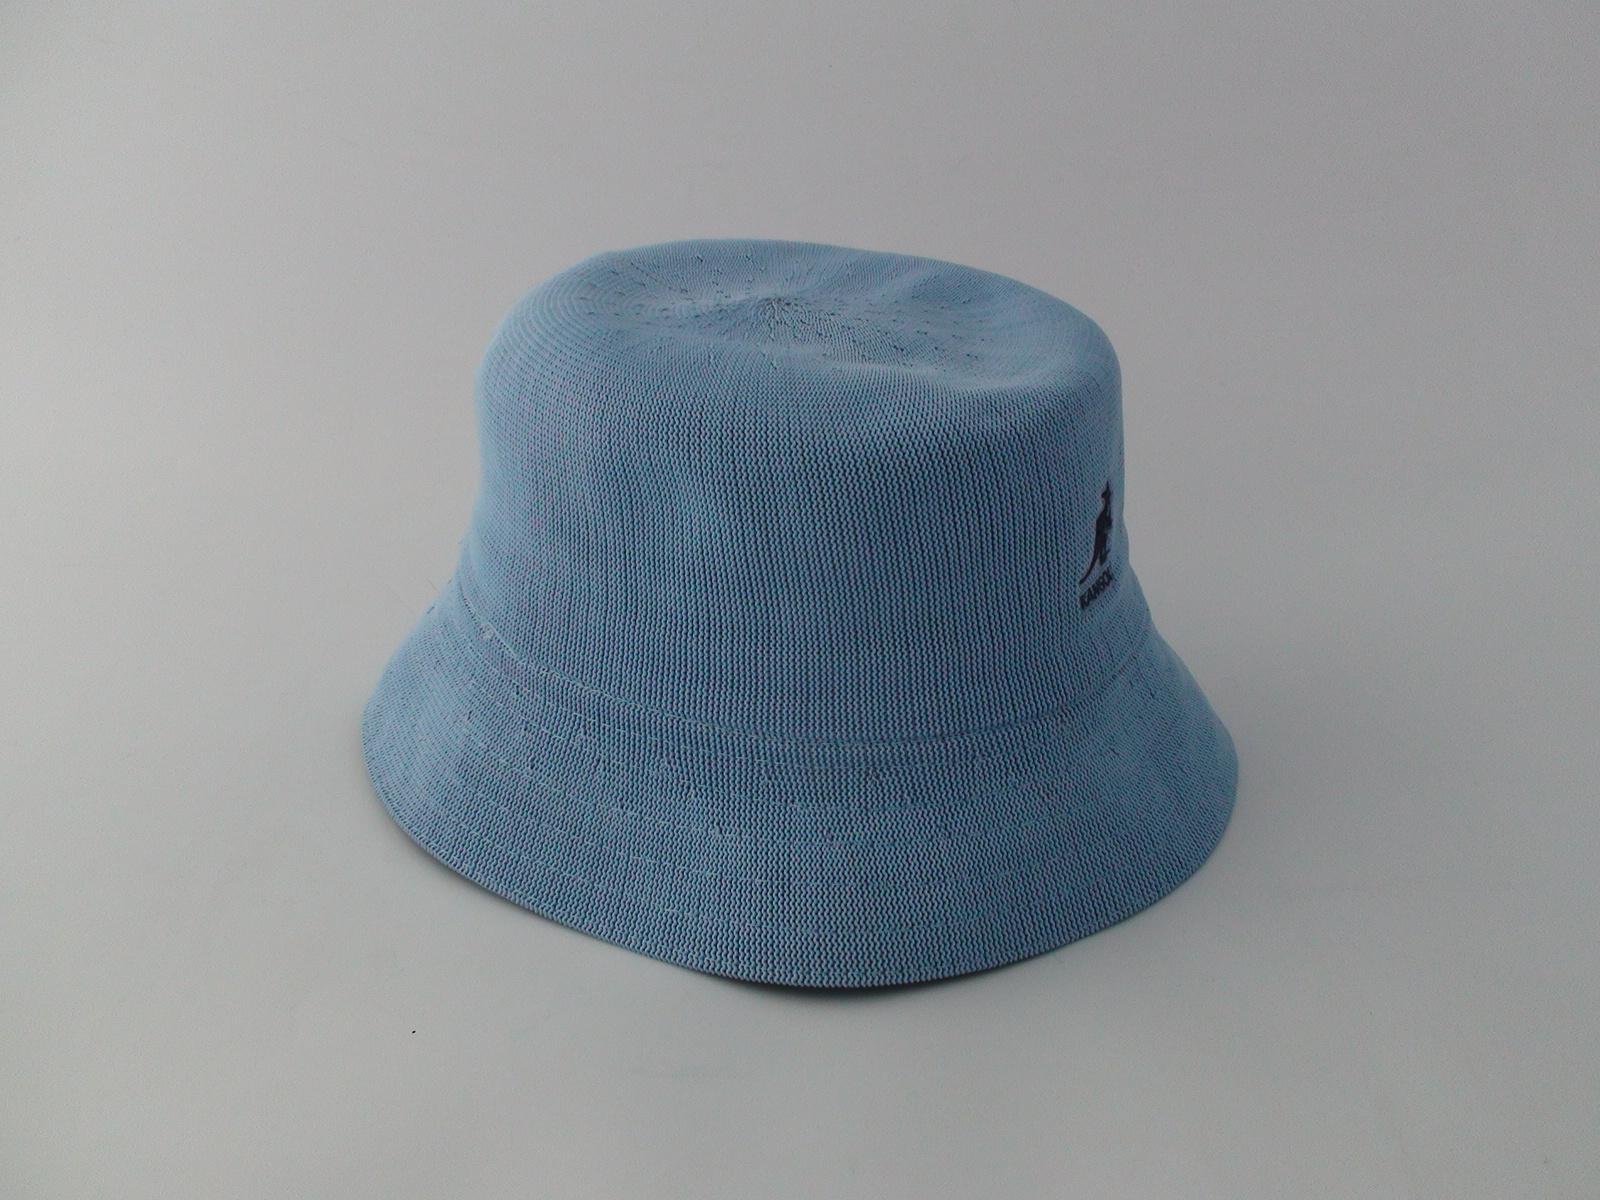 Kangol Tropic Bermuda Baby Blew Bucket Hat - Bernard Hats 2c03fe24cc7